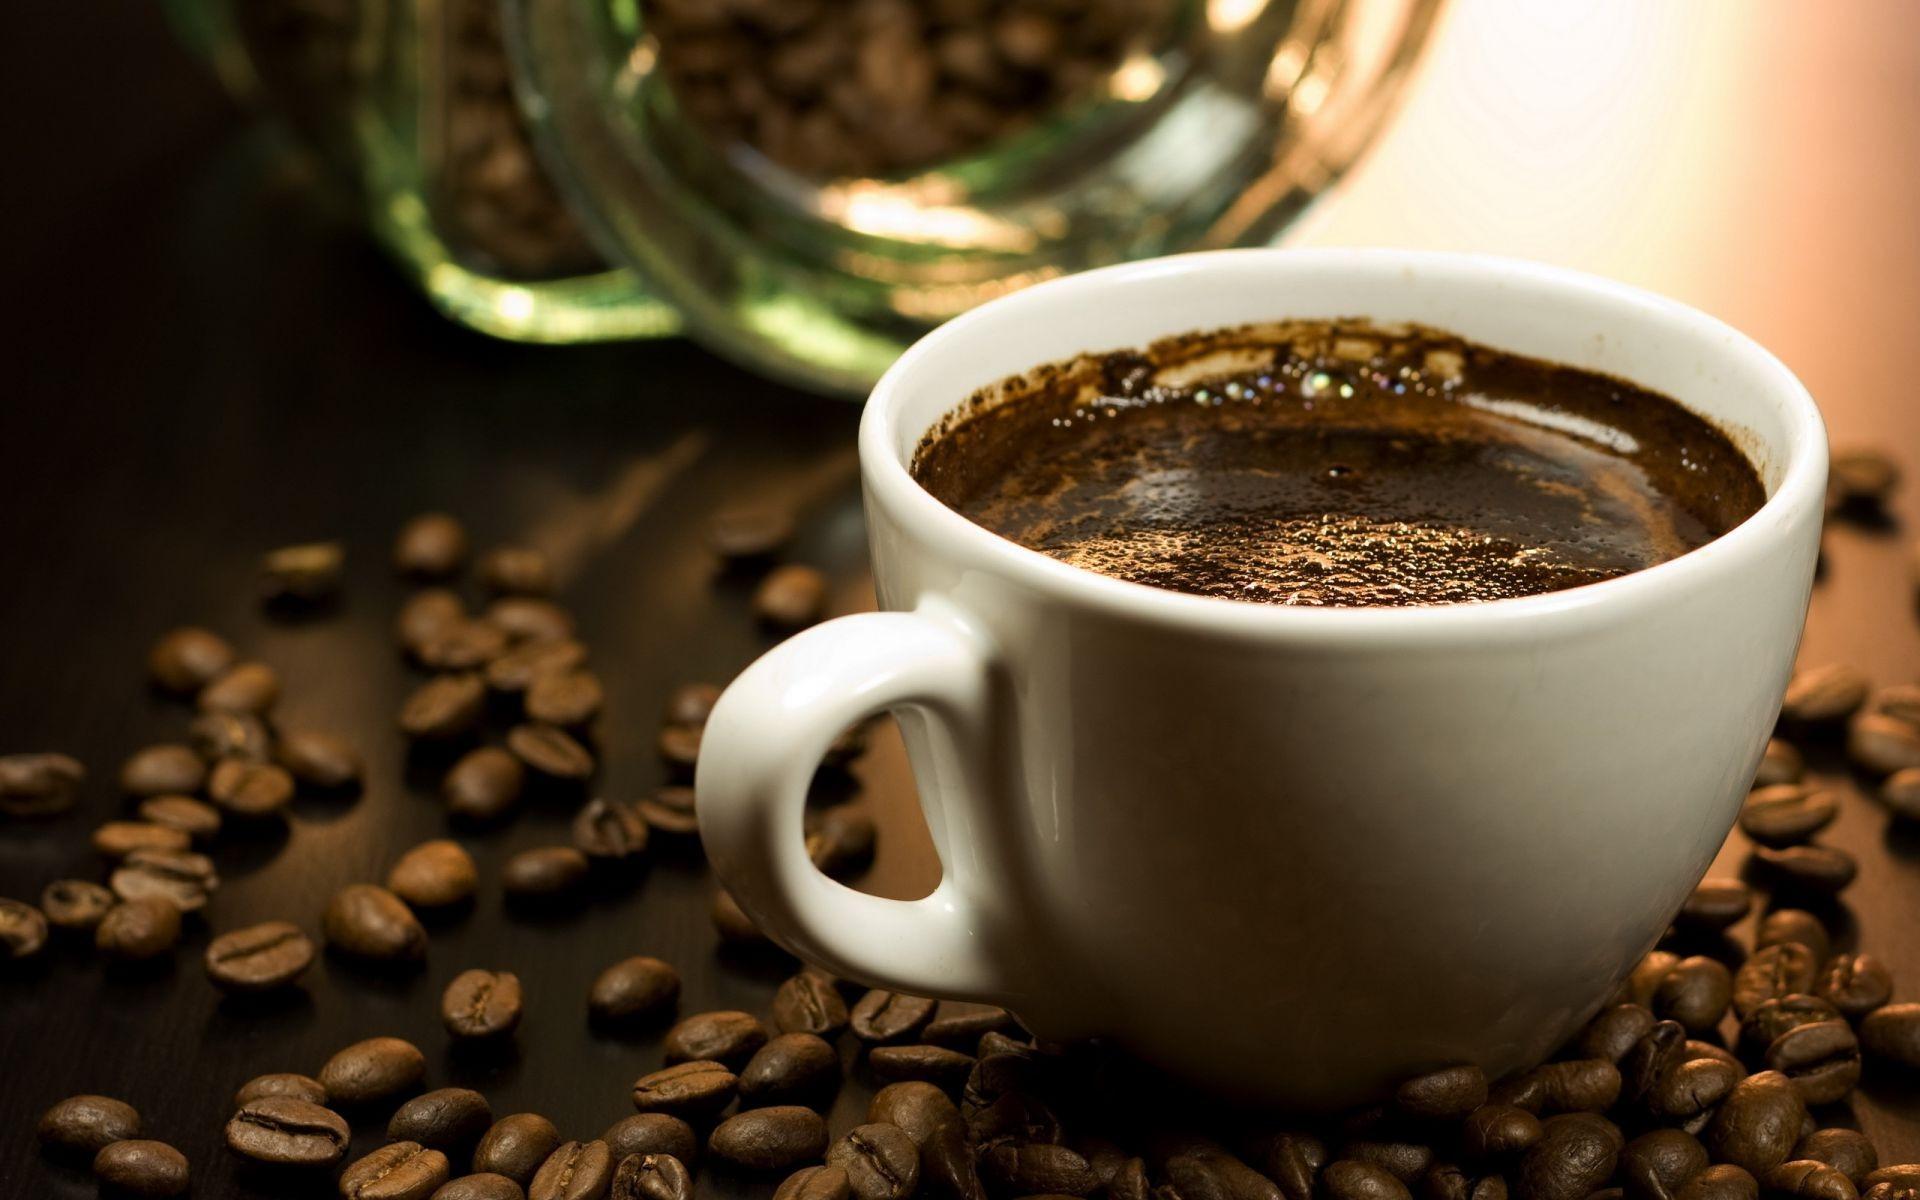 Картинки, картинка чашка кофе с надписью